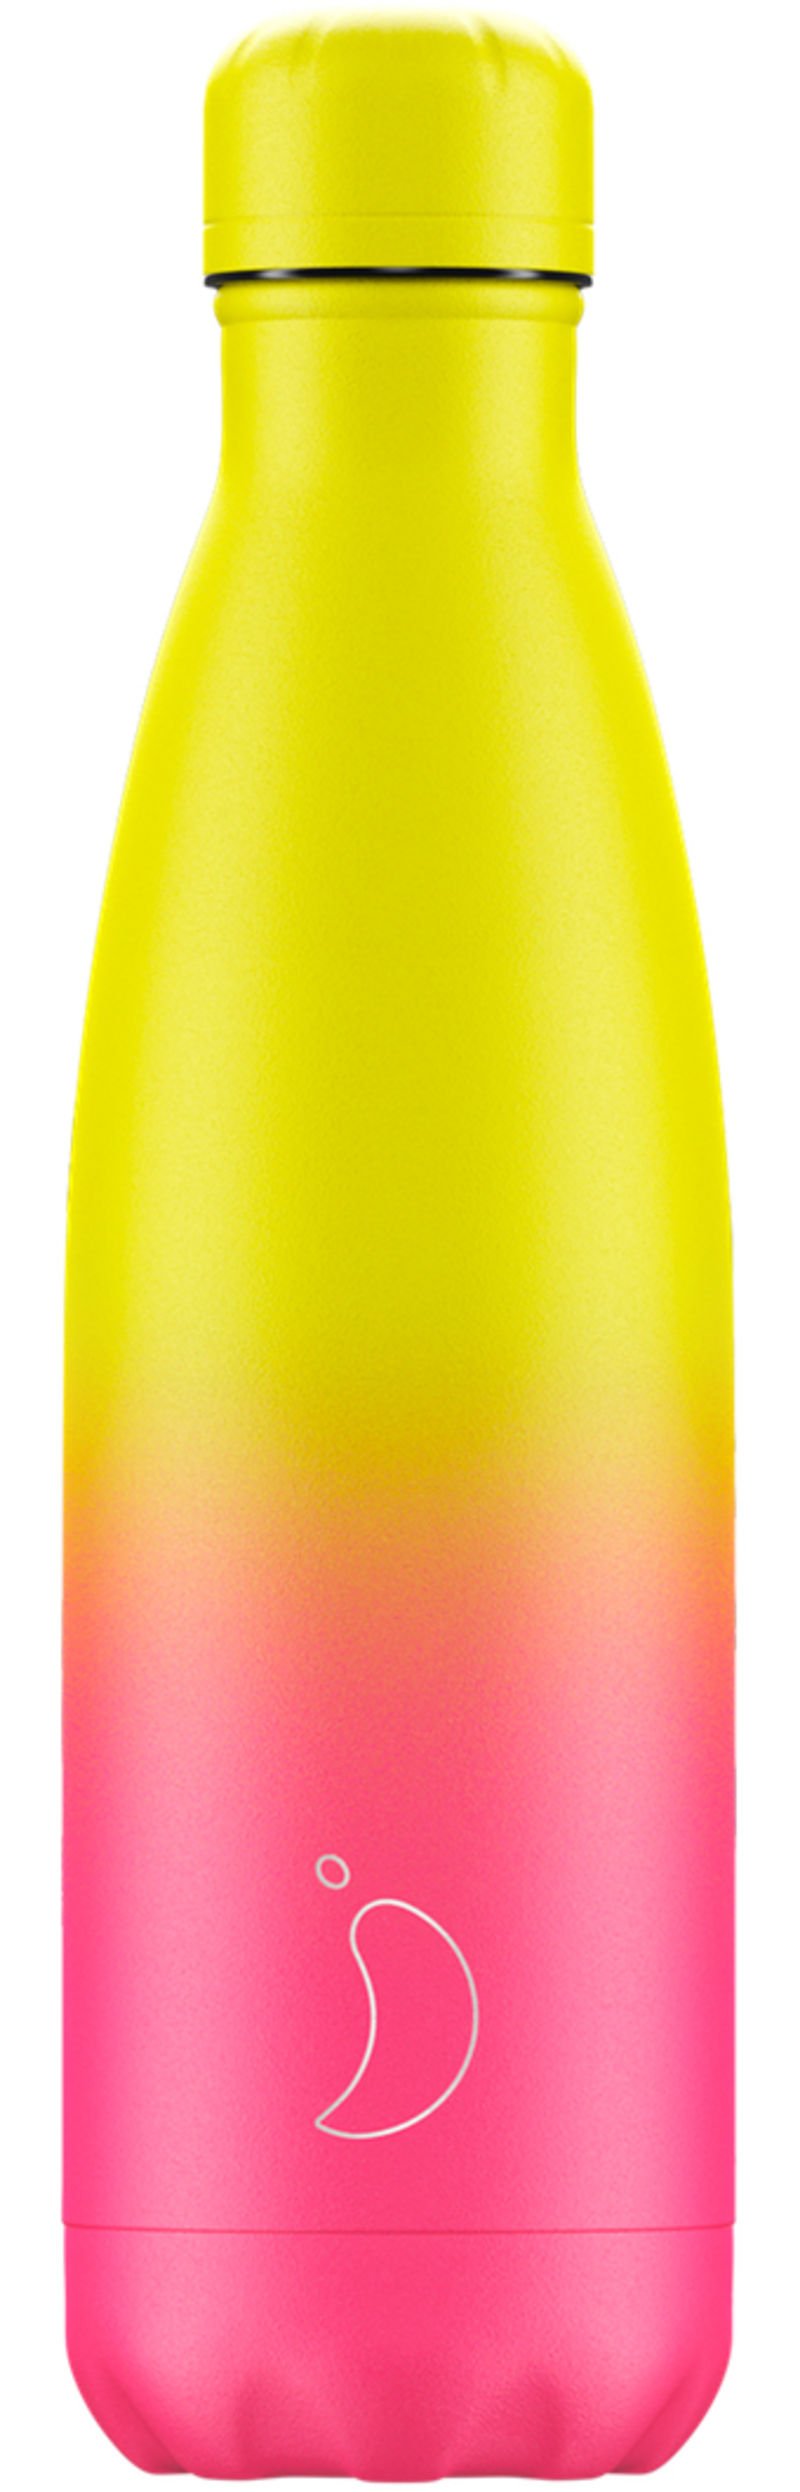 Botella Inox Gradient Neon Amarillo&rosa 500ml -